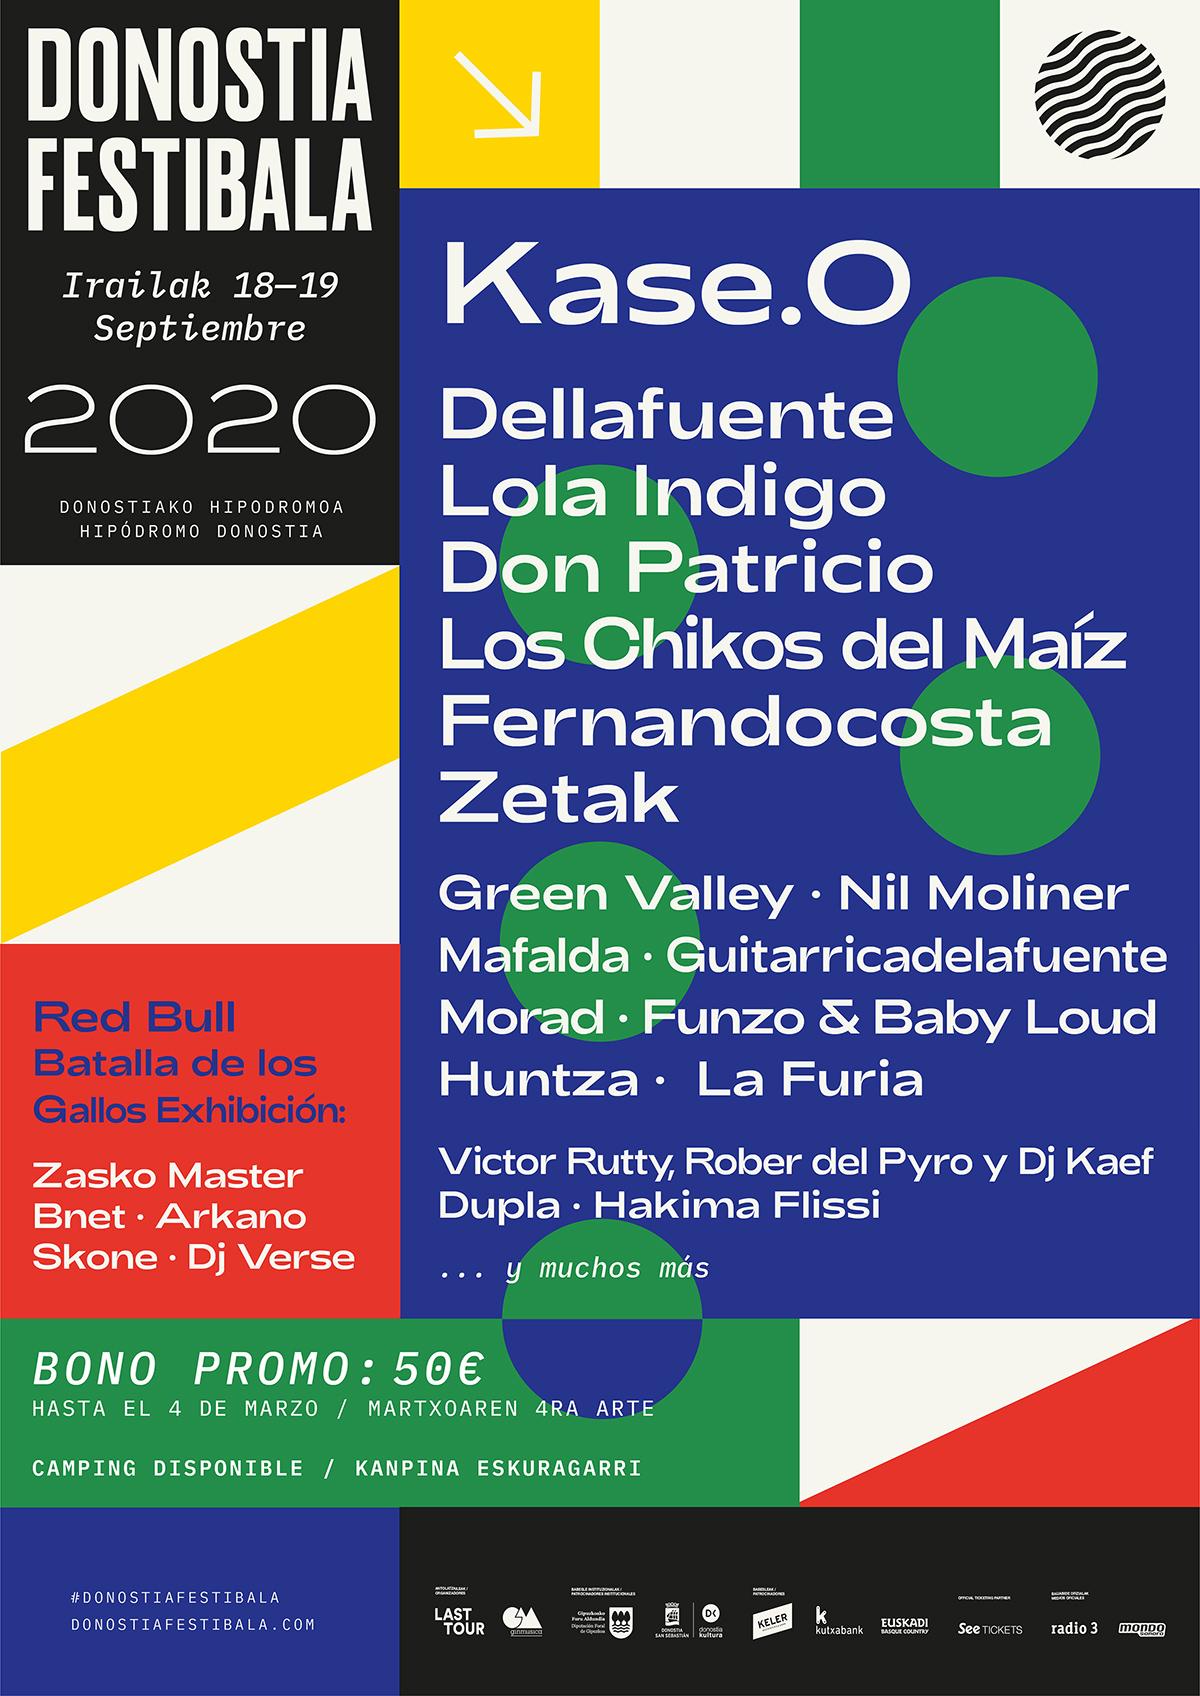 Donostia Kutxa Kultur Festibala - Página 7 Poster-DF20-12022020